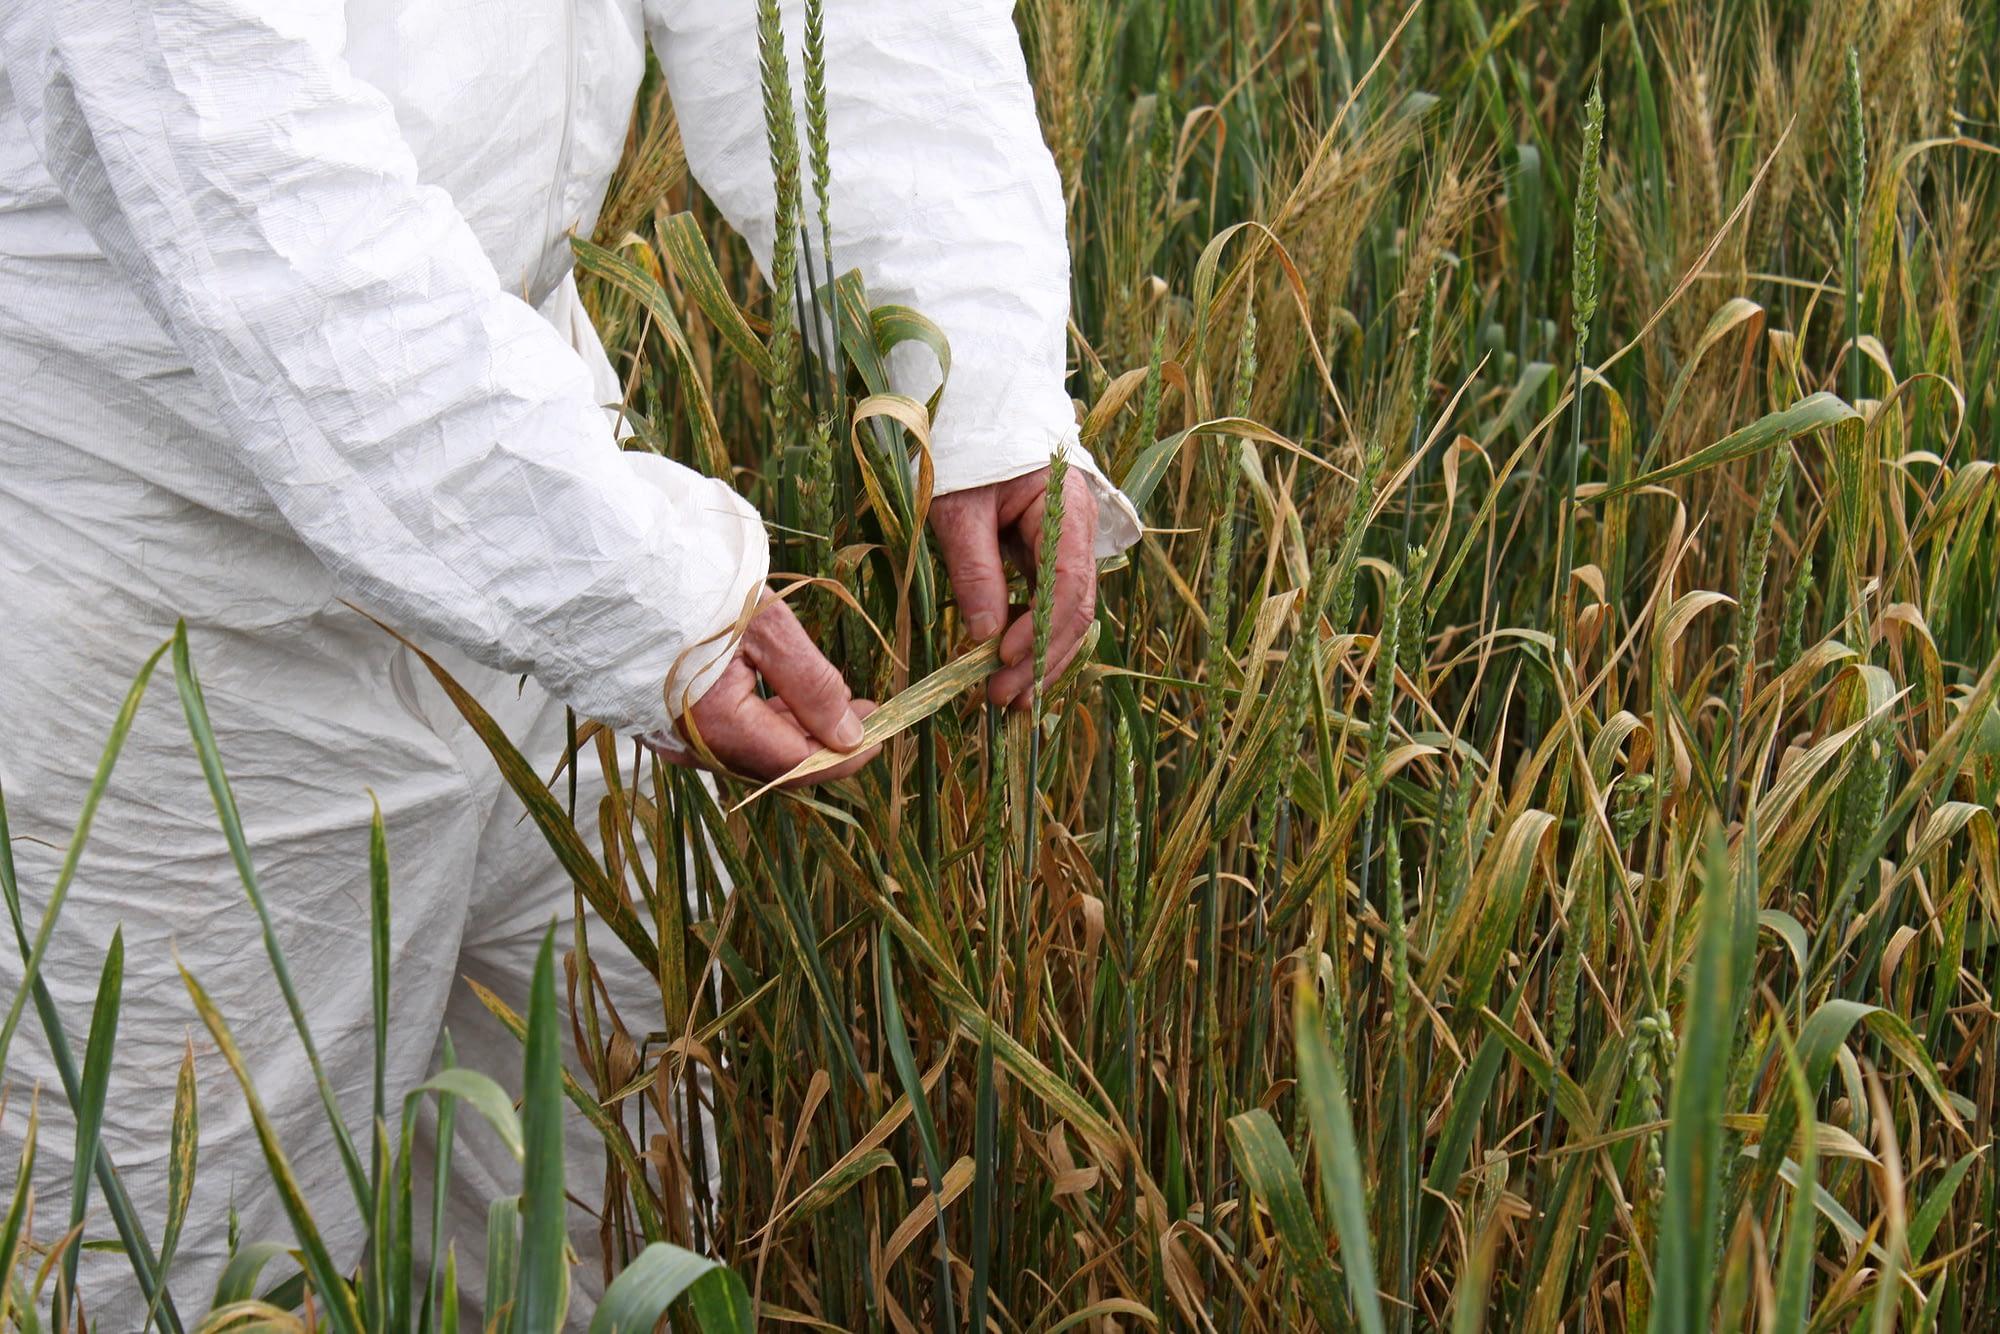 Wheat rust expert Bob McIntosh, of the Plant Breeding Institute, University of Sydney, Australia, examining rust symptoms on a wheat line in Kenya. (Photo: Petr Kosina/CIMMYT)